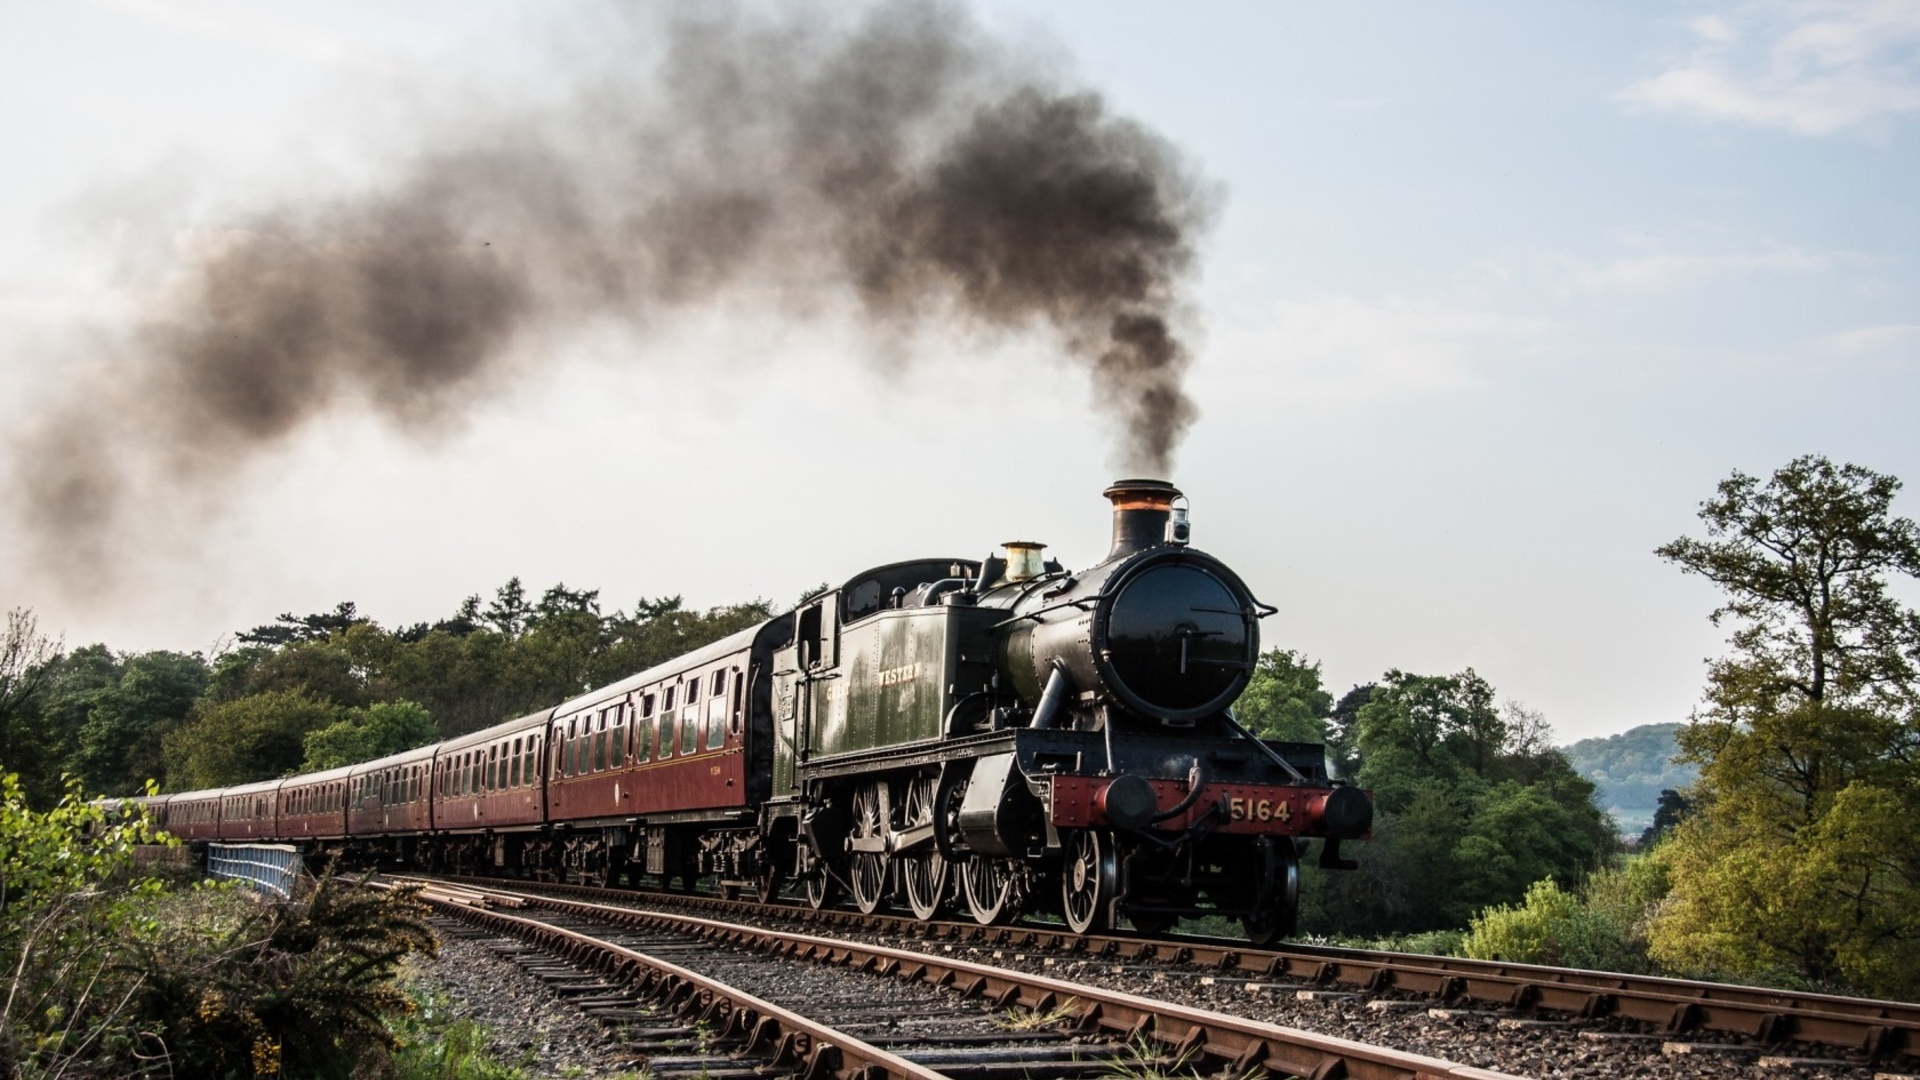 Обои на рабочий стол 1366х768 локомотив